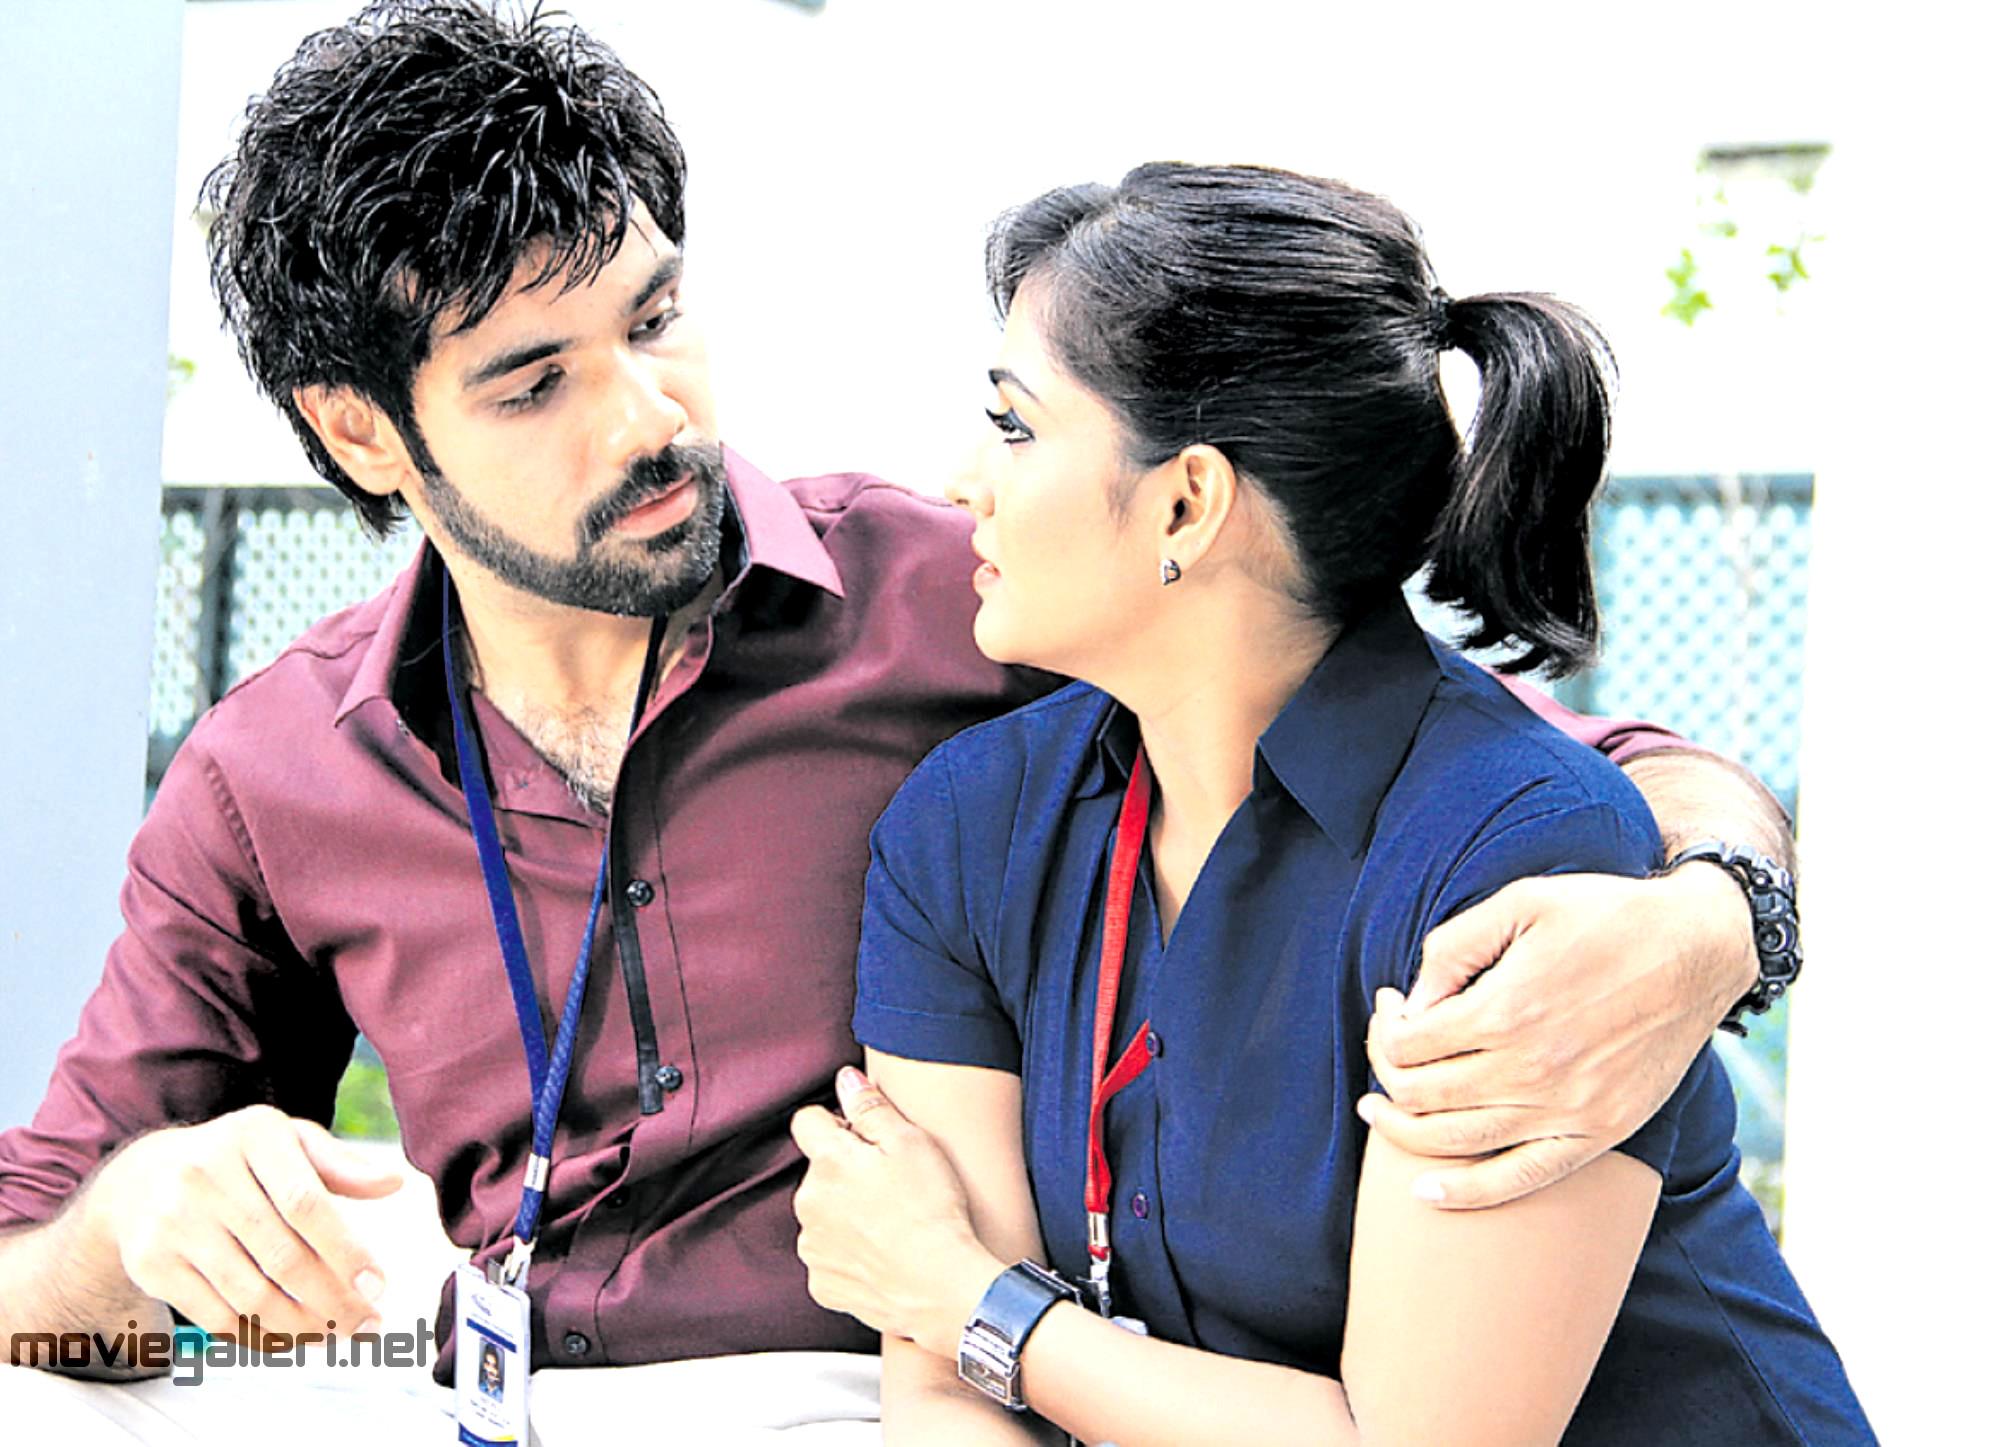 Sibiraj Remya Nambeesan Sathya movie release date 8 December